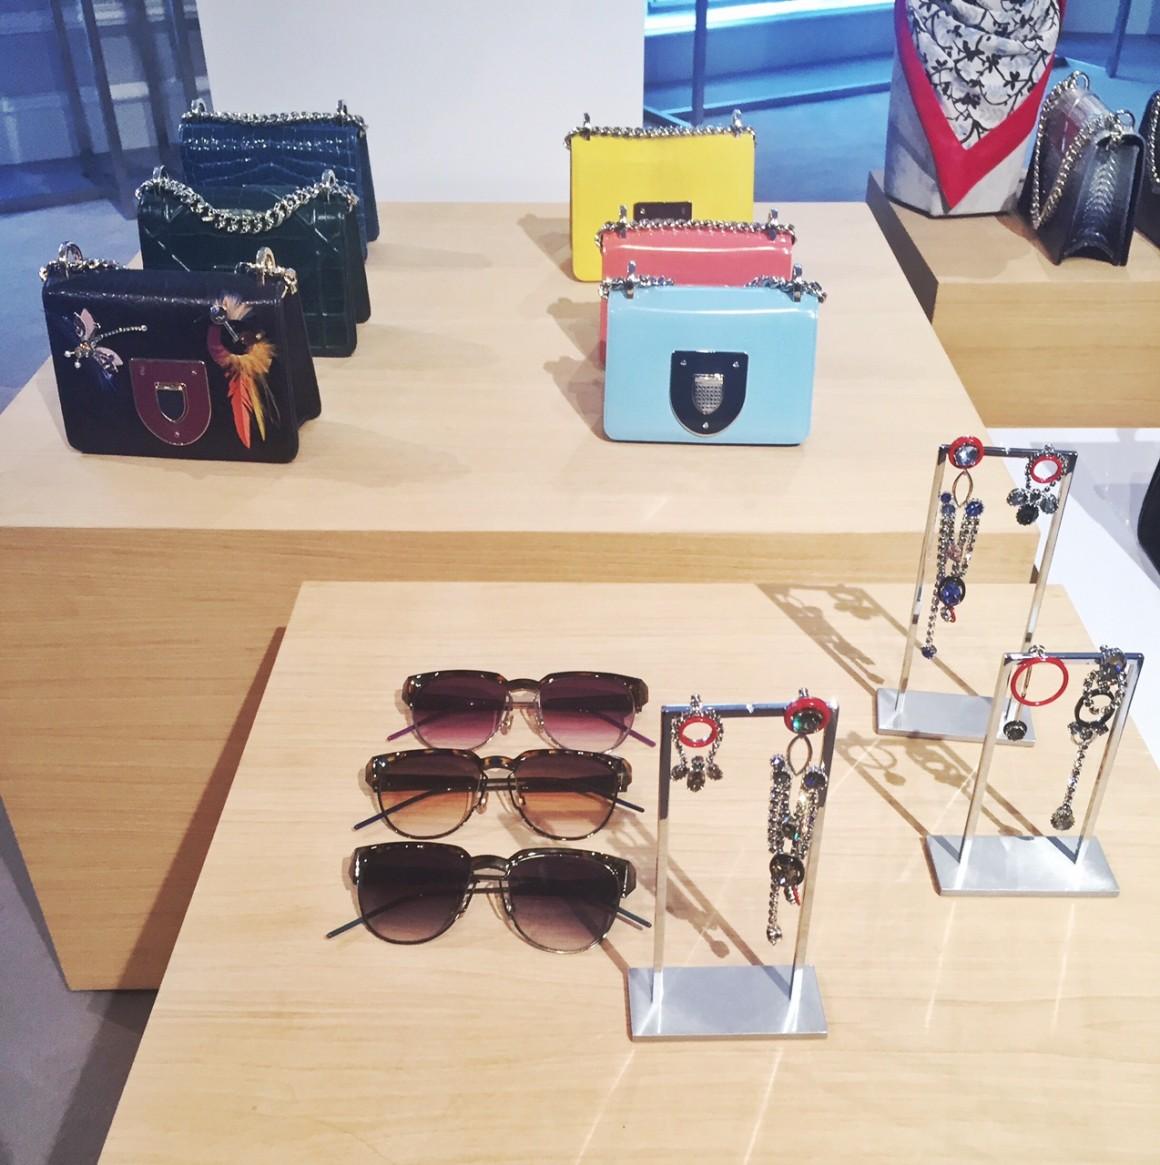 avec-hannah-romao-dior-showroom-diorever-fashionweek-paris-pfw-prefall-preco-2